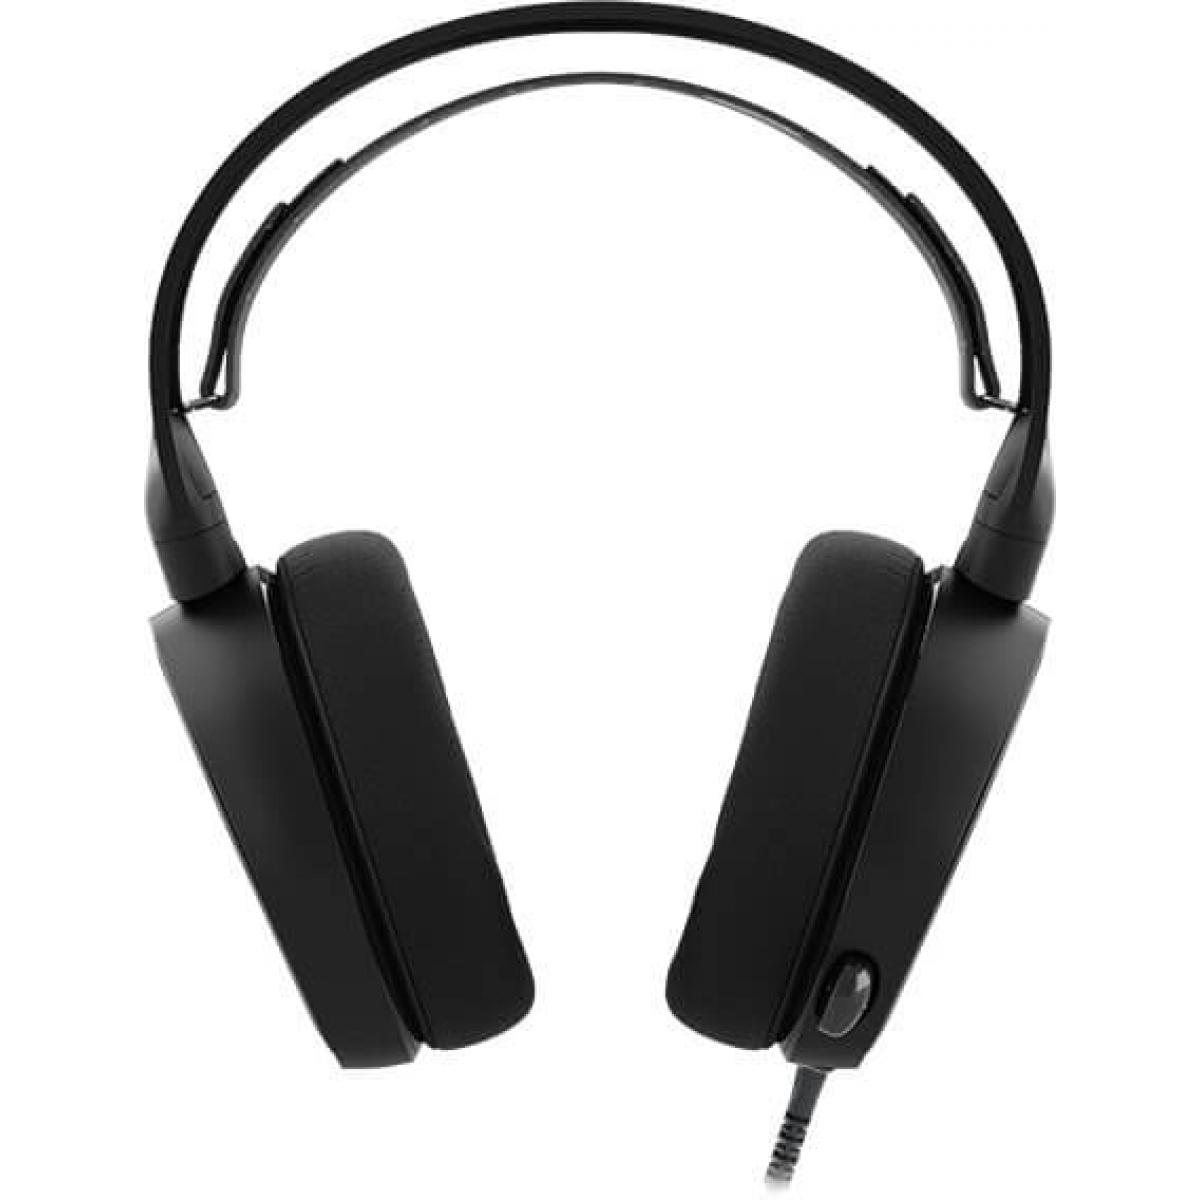 Headset Gamer Steelseries Arctis 3 7.1 Surround Preto 61433